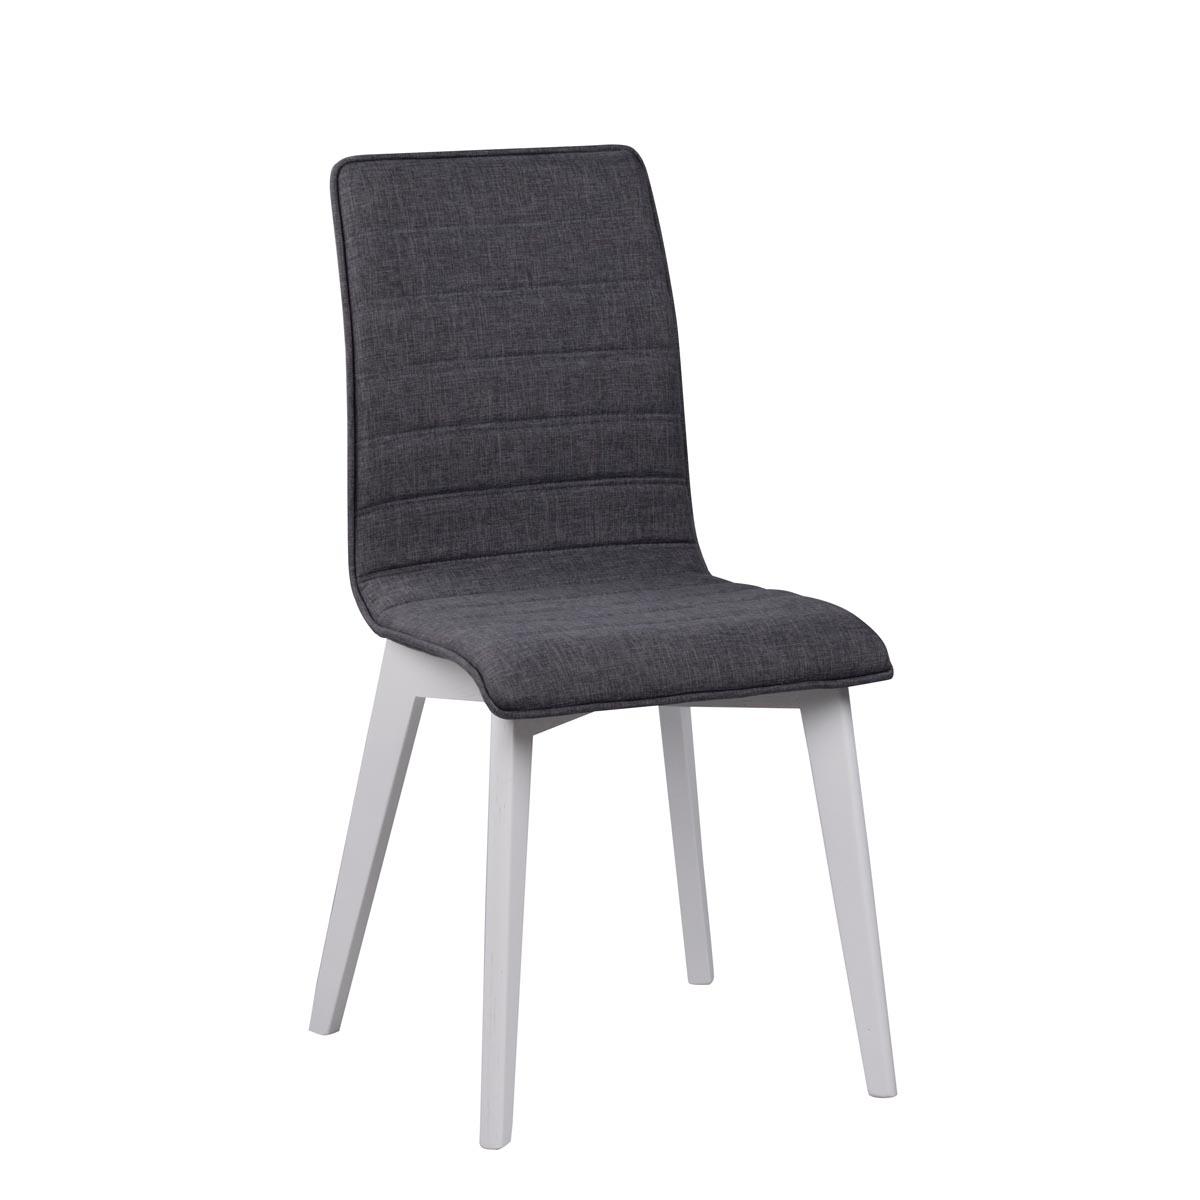 Febe-stol-morkgra-tyg-vit-Grace-113641